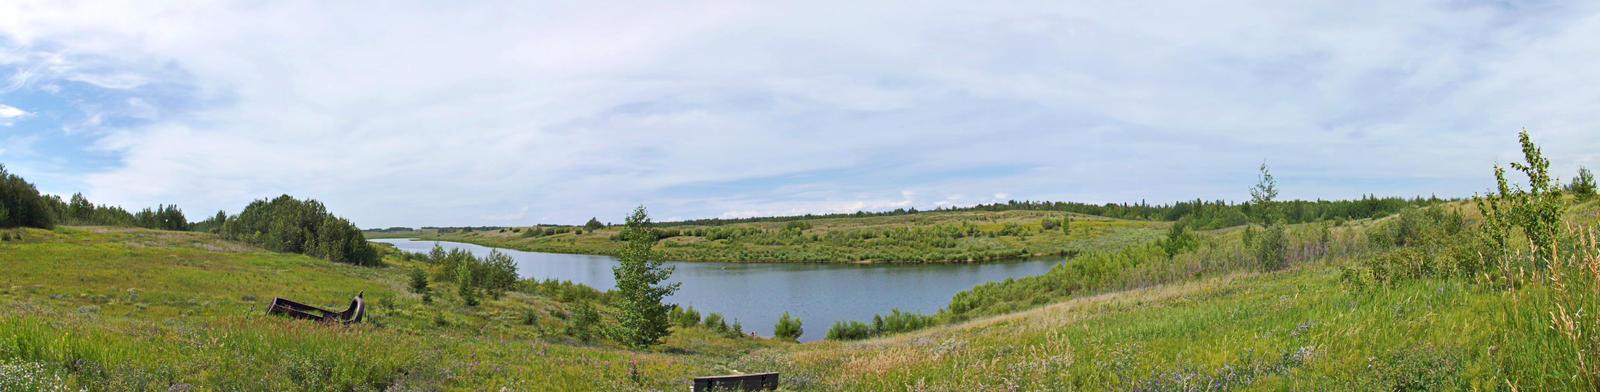 East Pit Lake Alberta by MindlessAngel